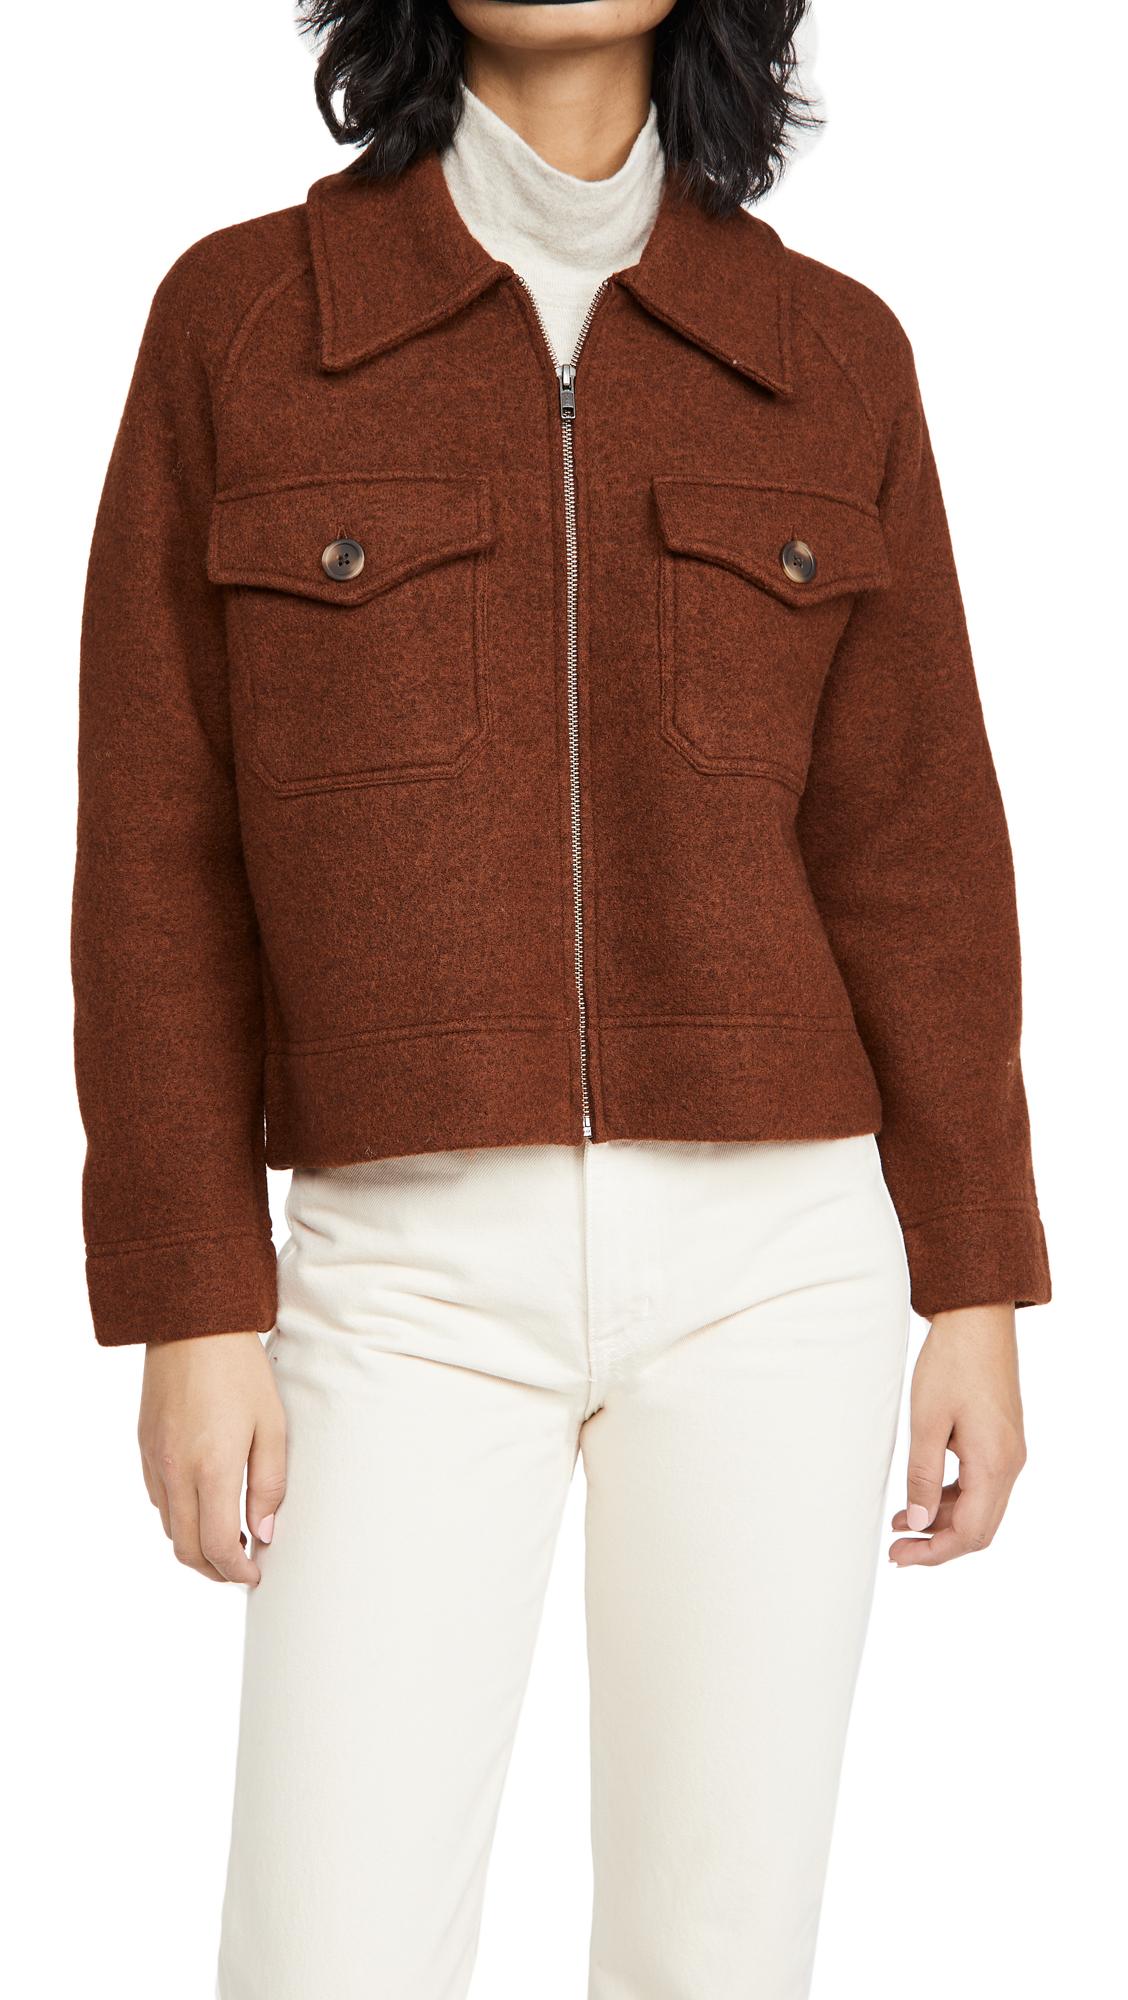 Madewell Jordan Zip Up Sweater